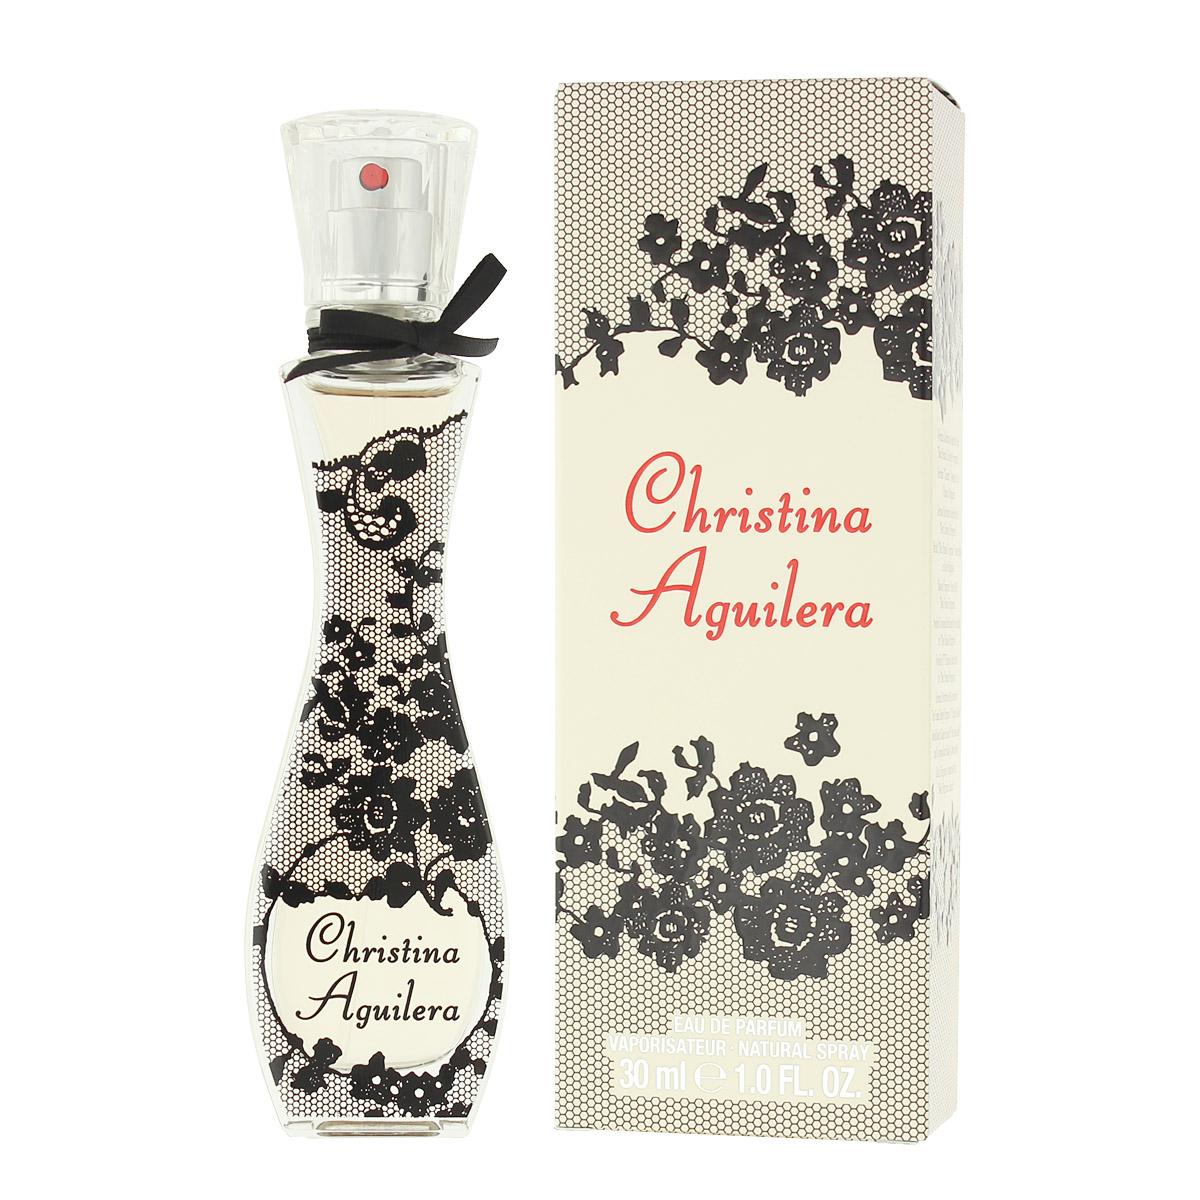 Christina Aguilera Christina Aguilera Eau De Parfum 30 ml (woman) 66505